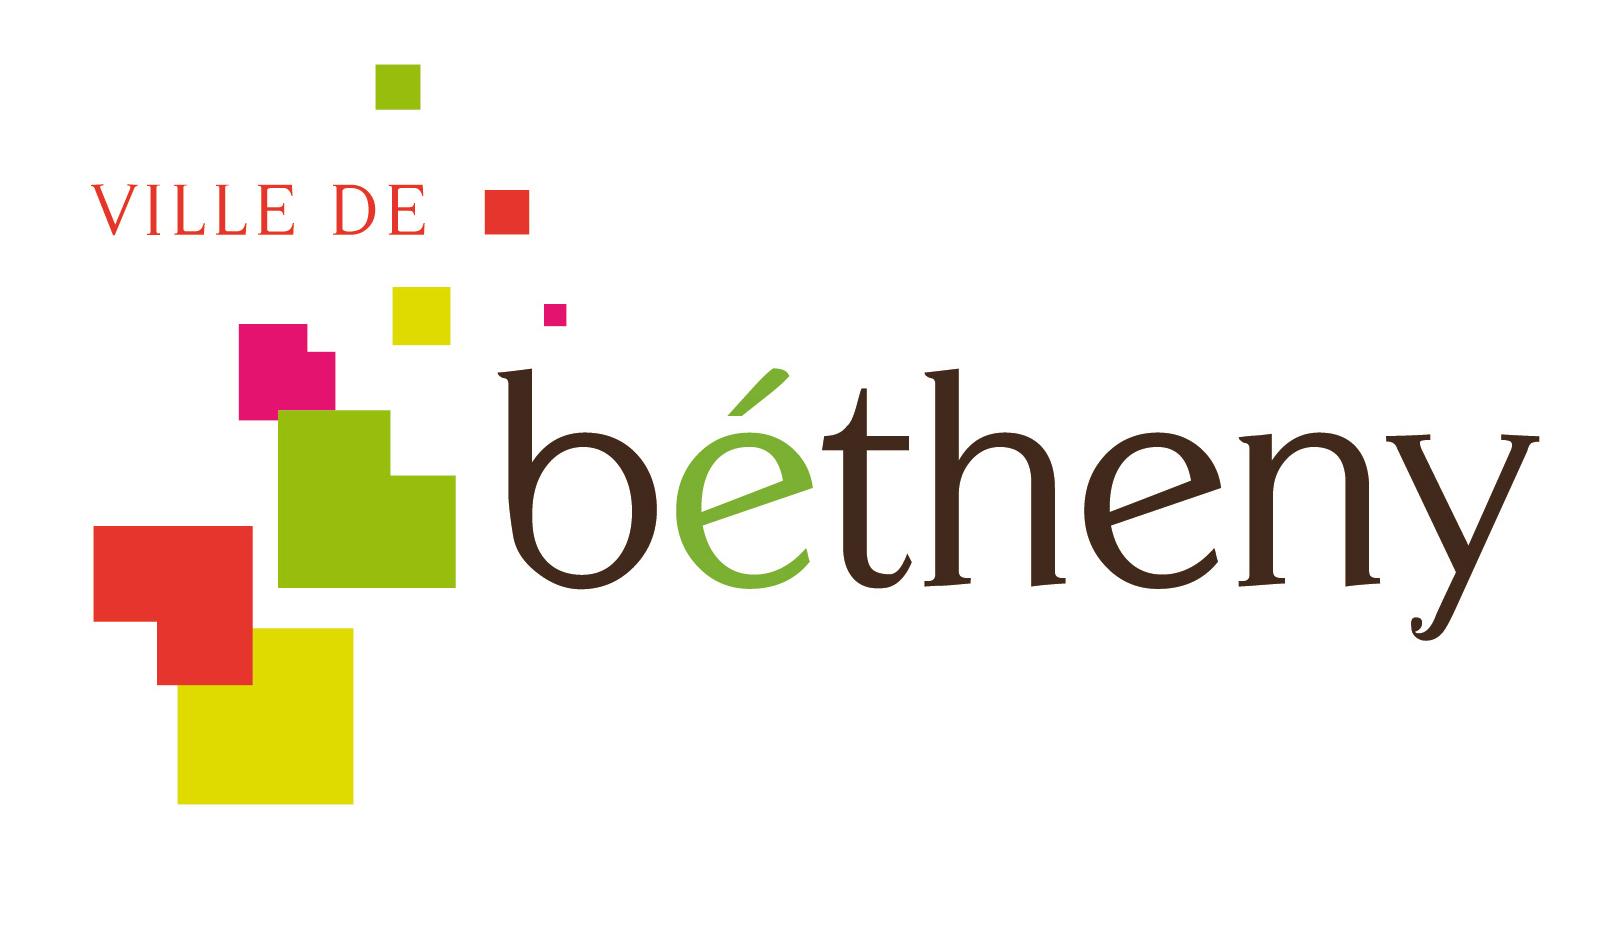 Ville de Bétheny